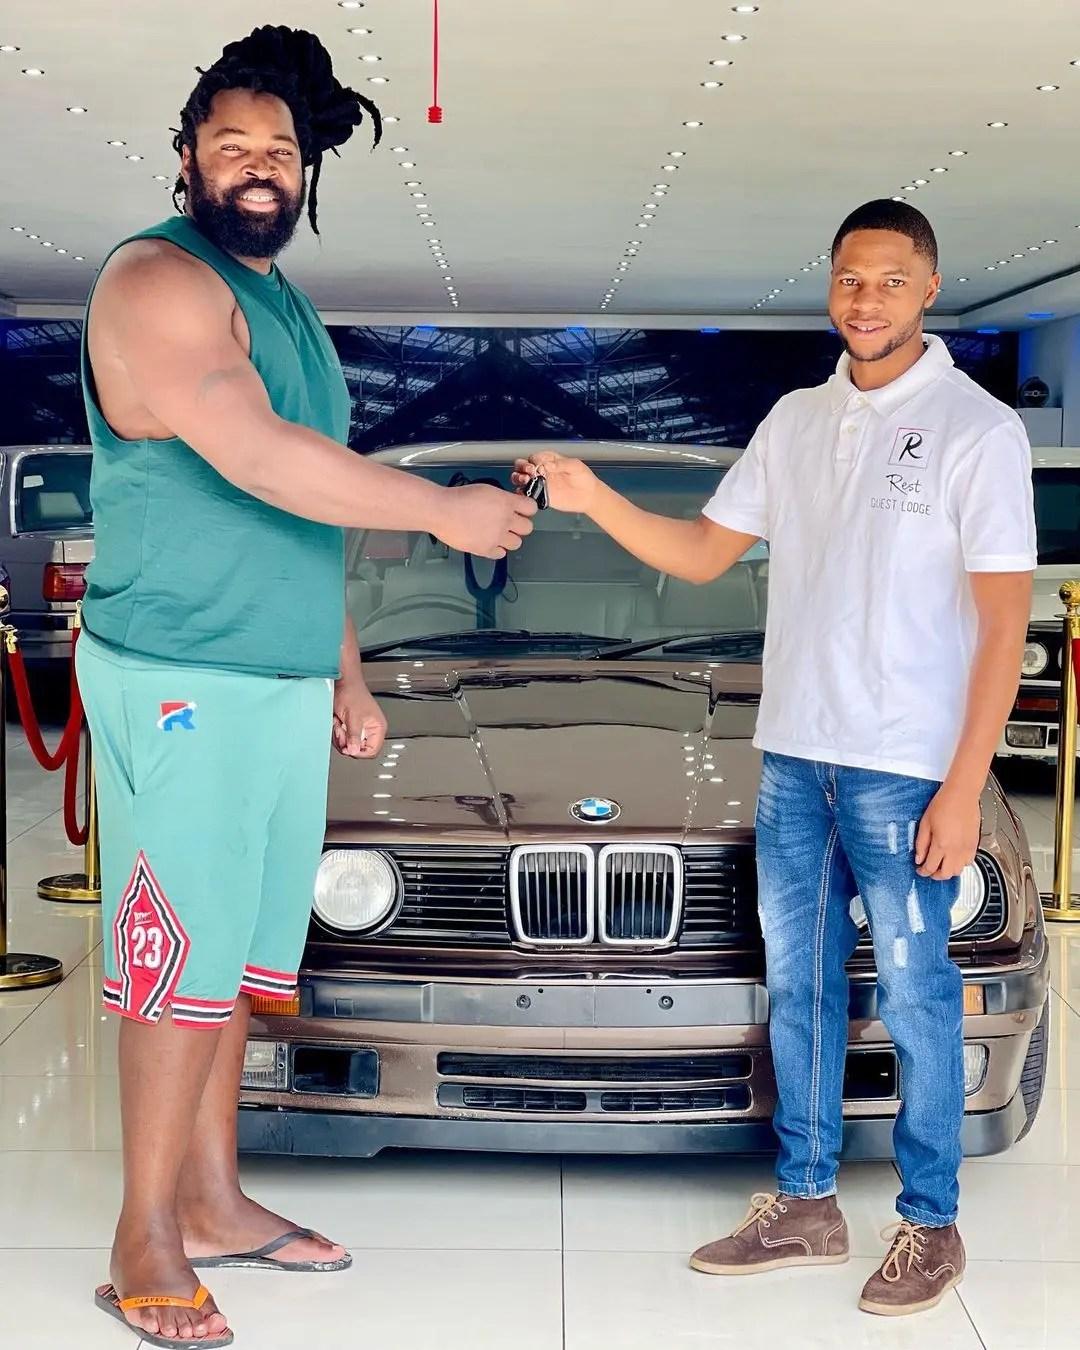 Big Zulu blesses himself with a brand new BMW car – Photos